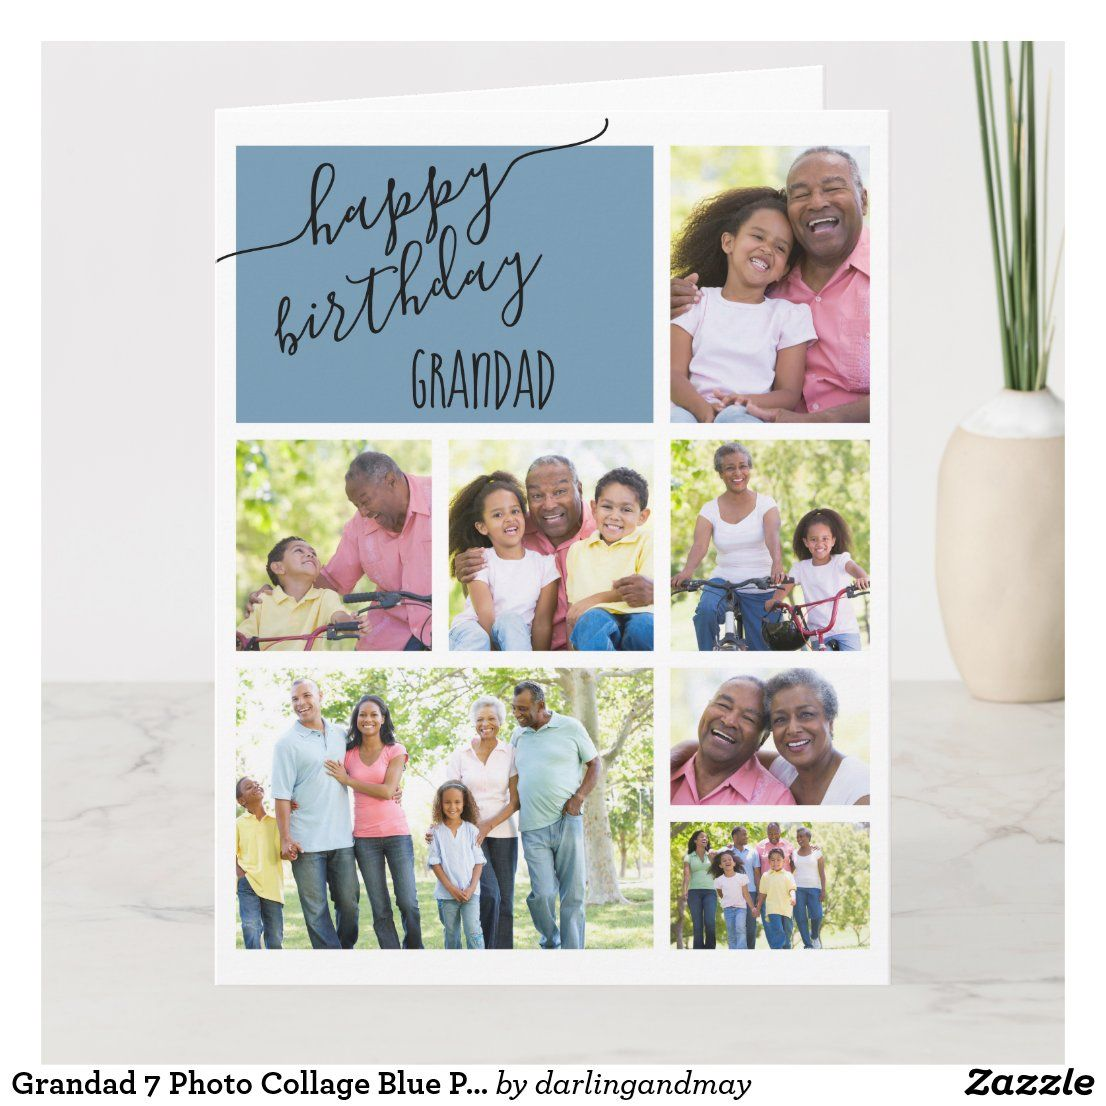 Grandad 7 Photo Collage Blue Personalized Birthday Card Zazzle Com Personalized Birthday Cards Birthday Cards Birthday Cards For Mom